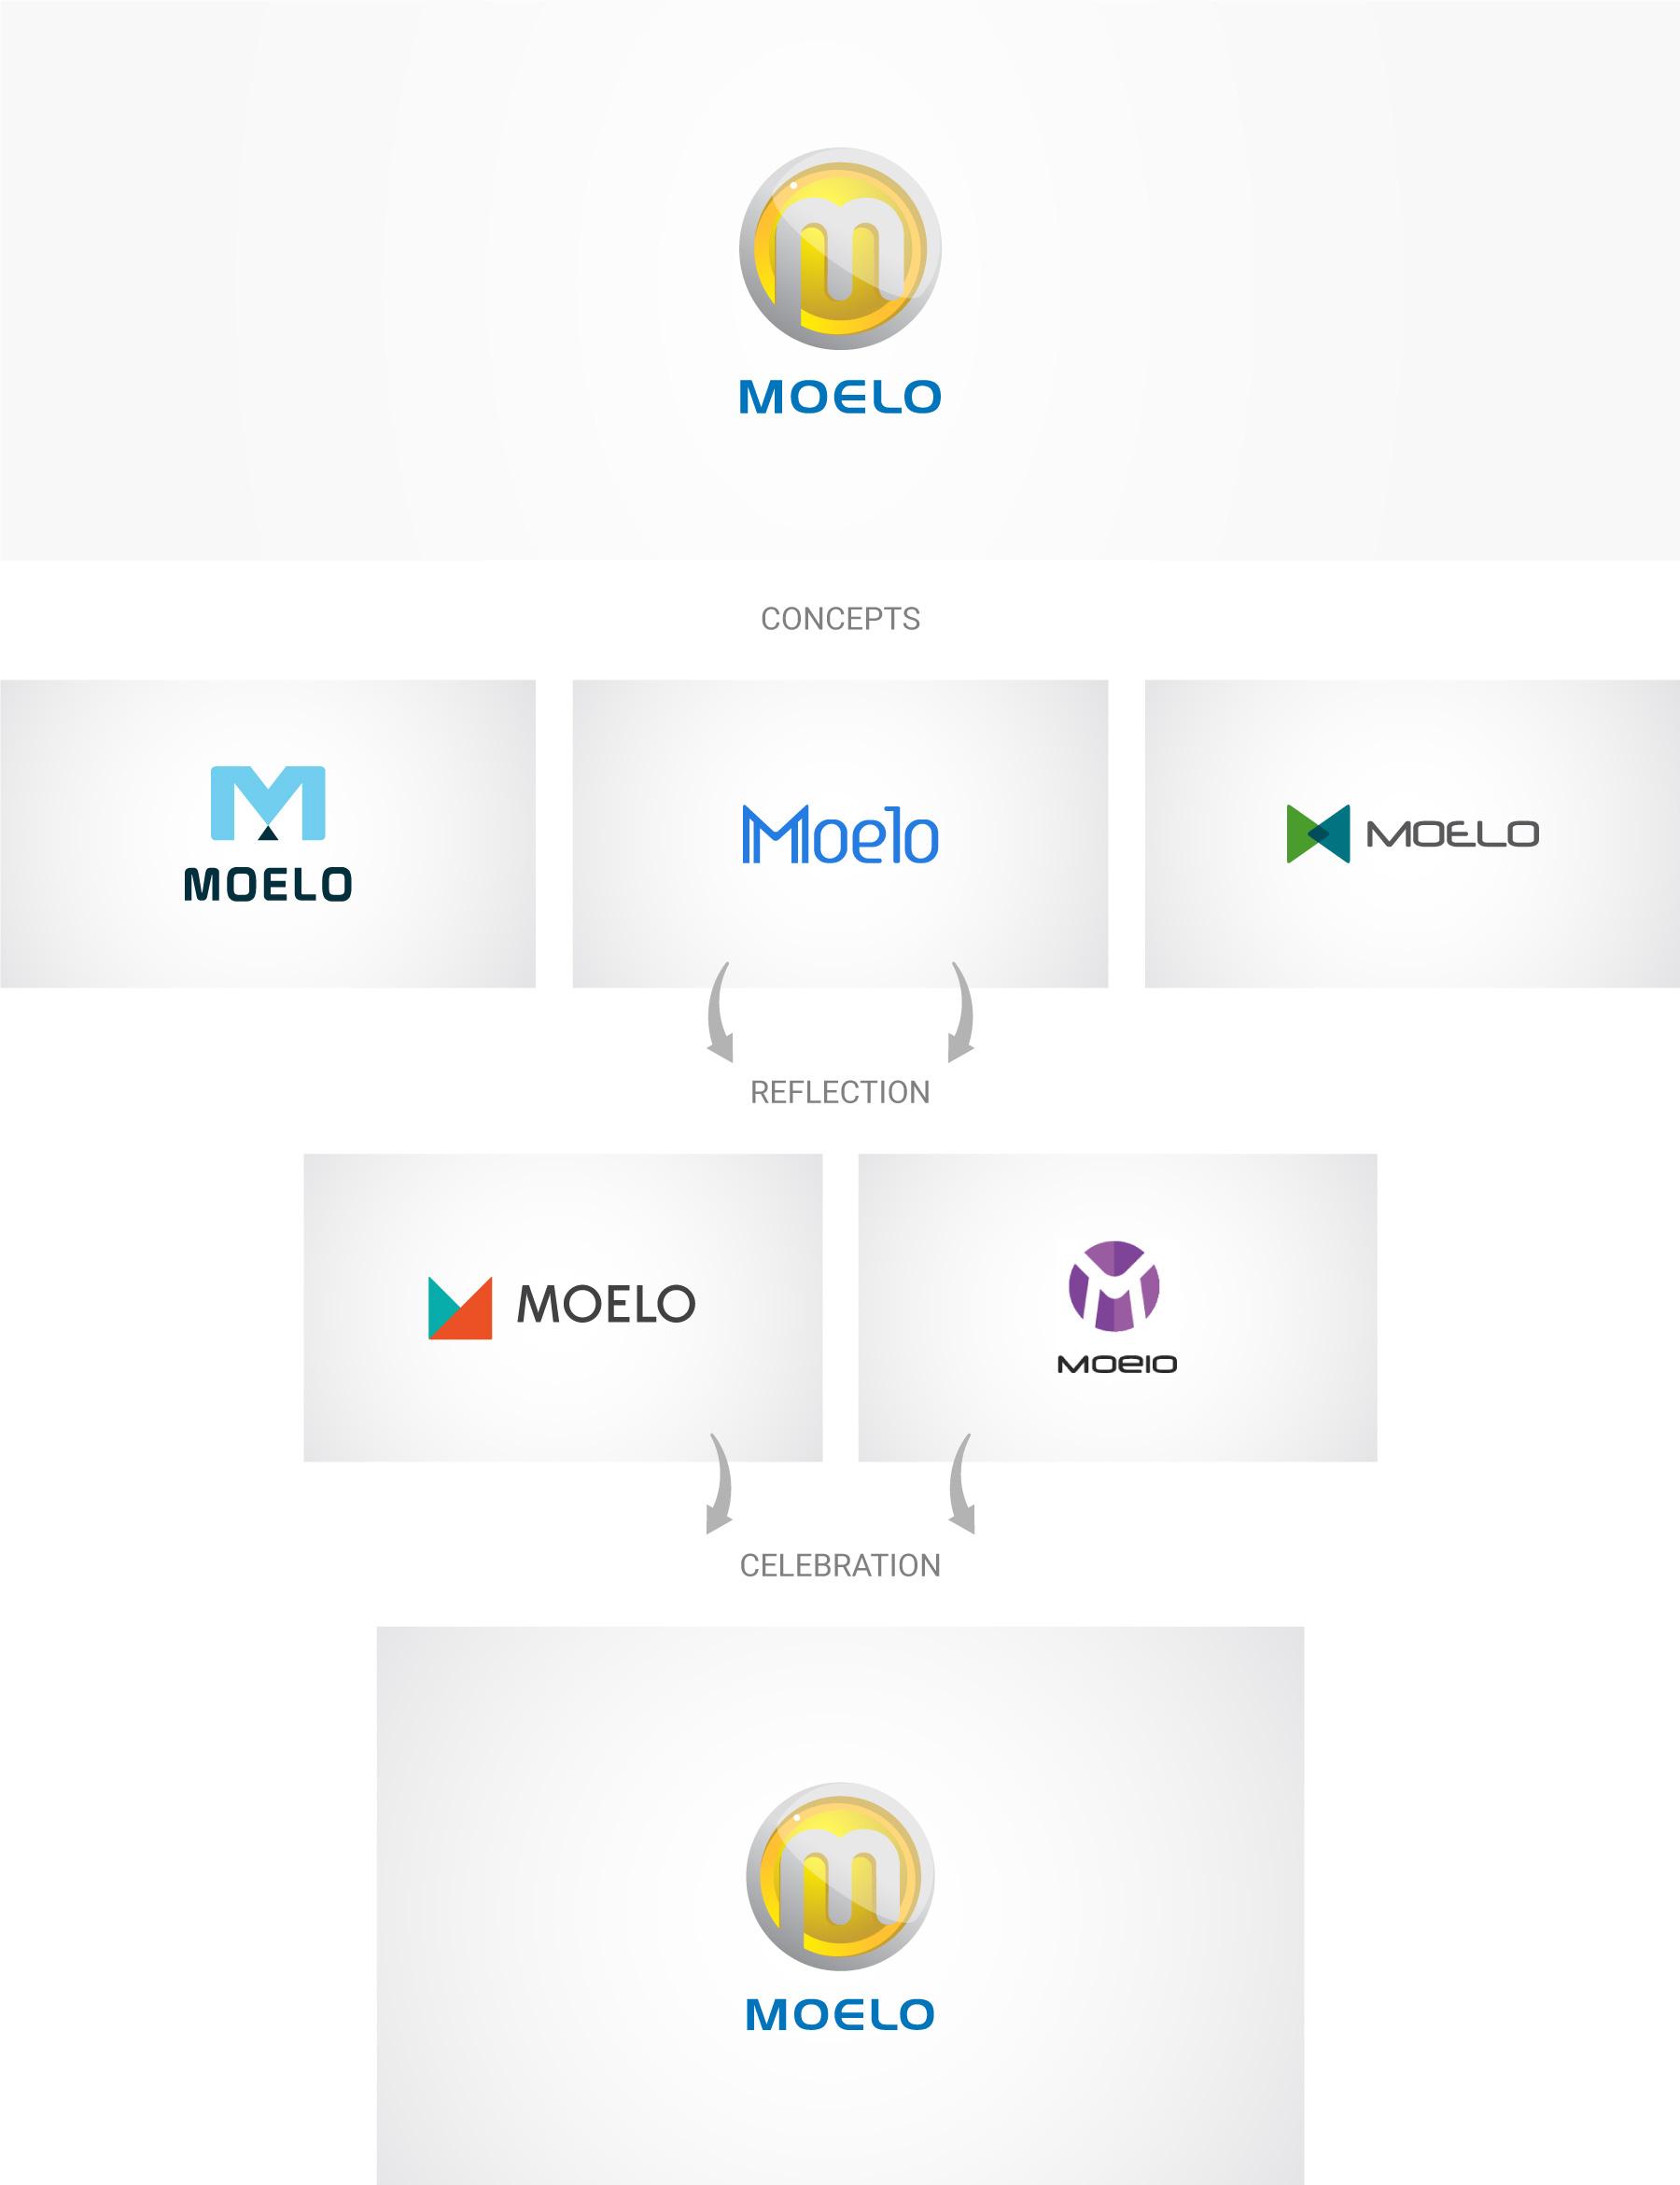 Moelo-logo-design